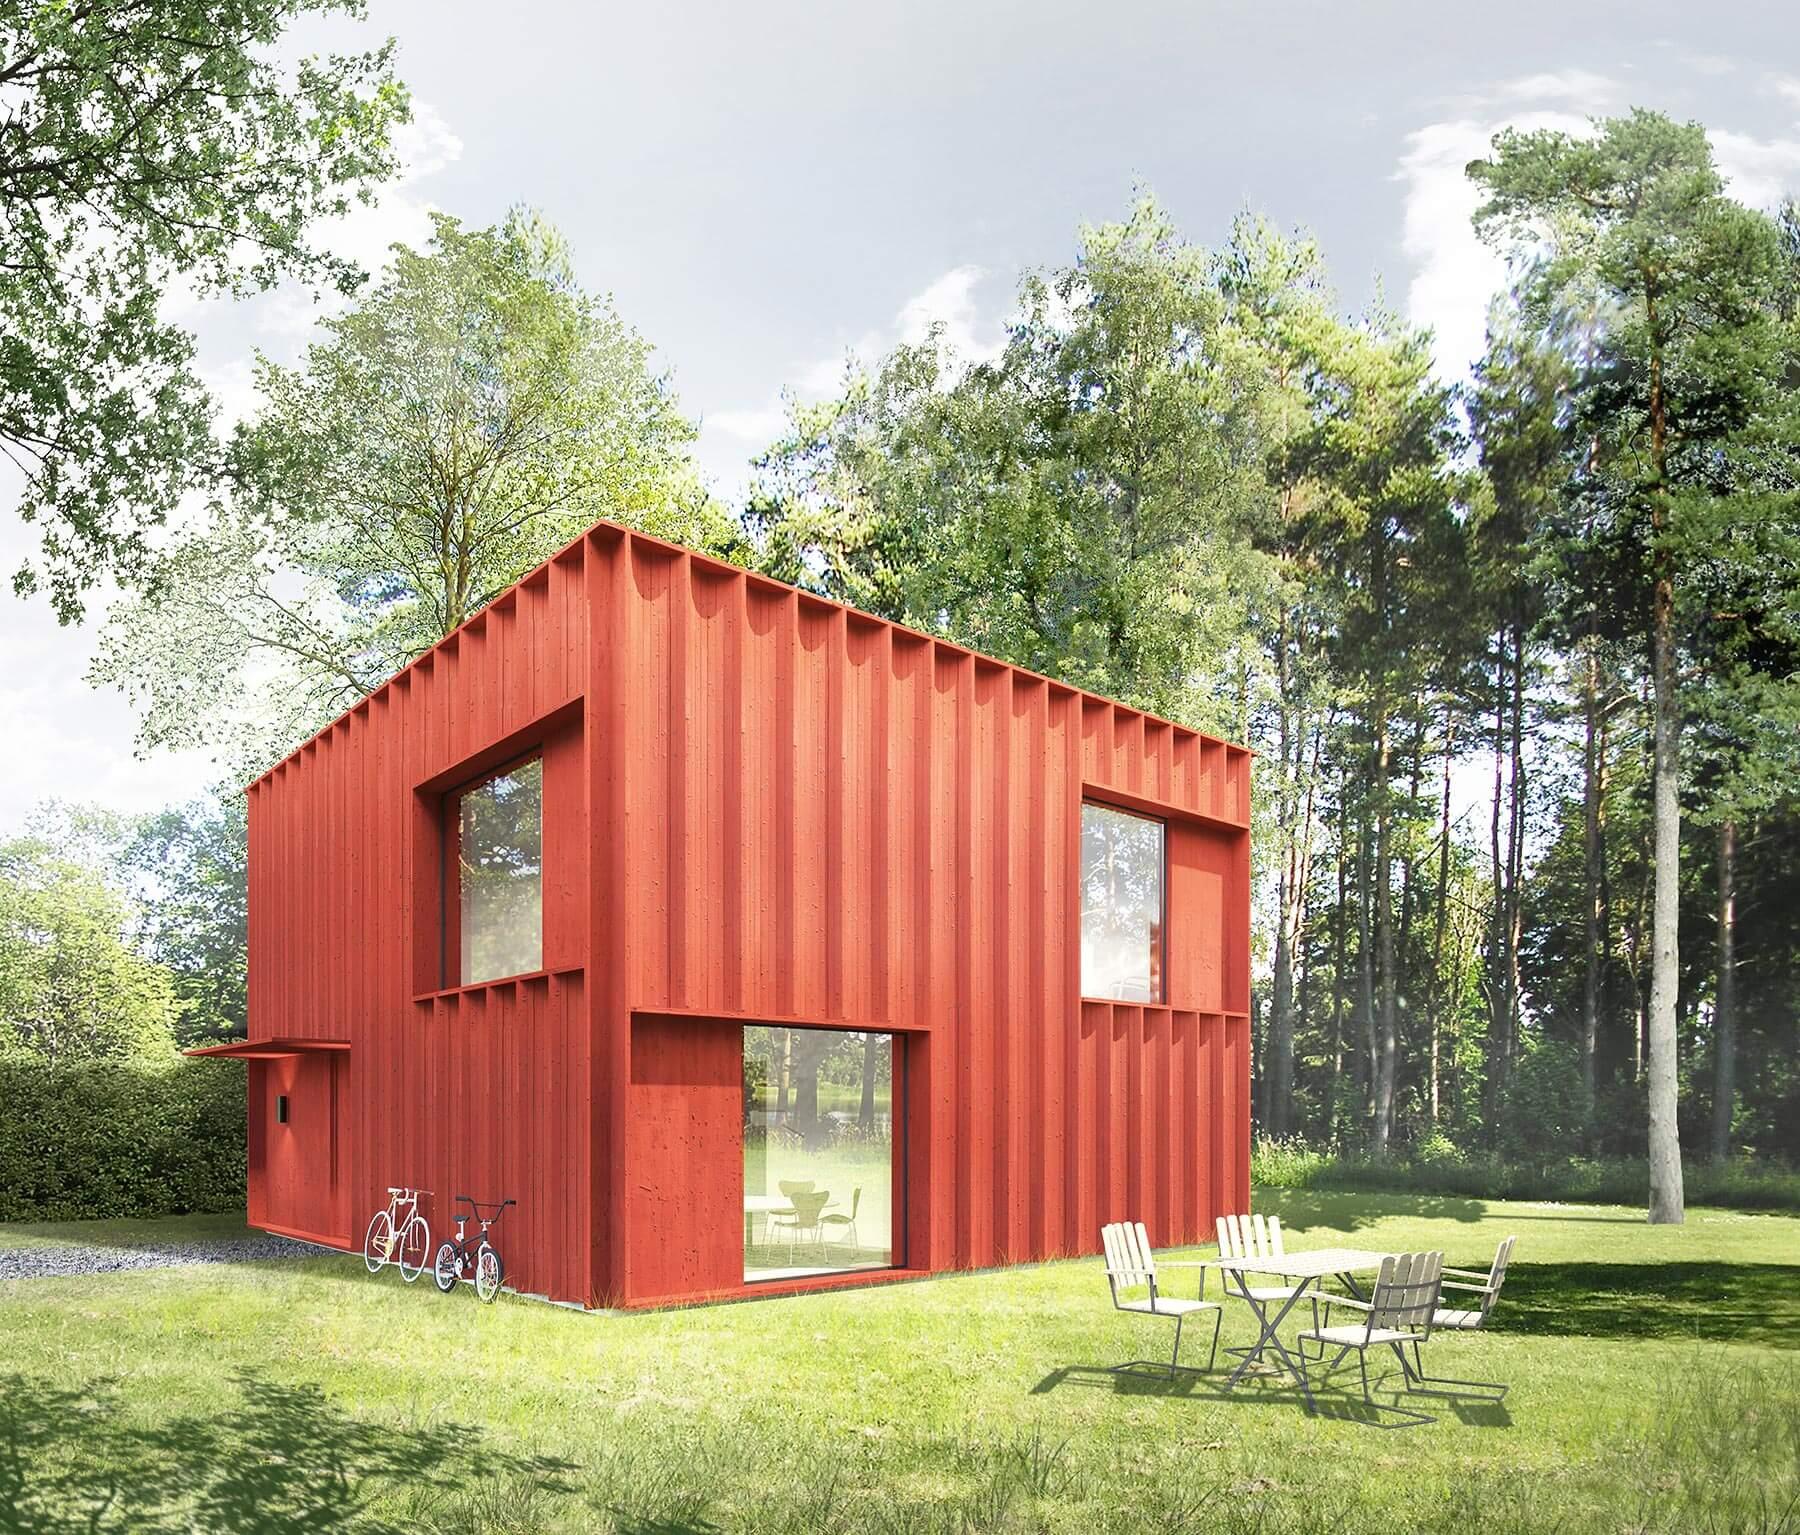 Modular style small square house design